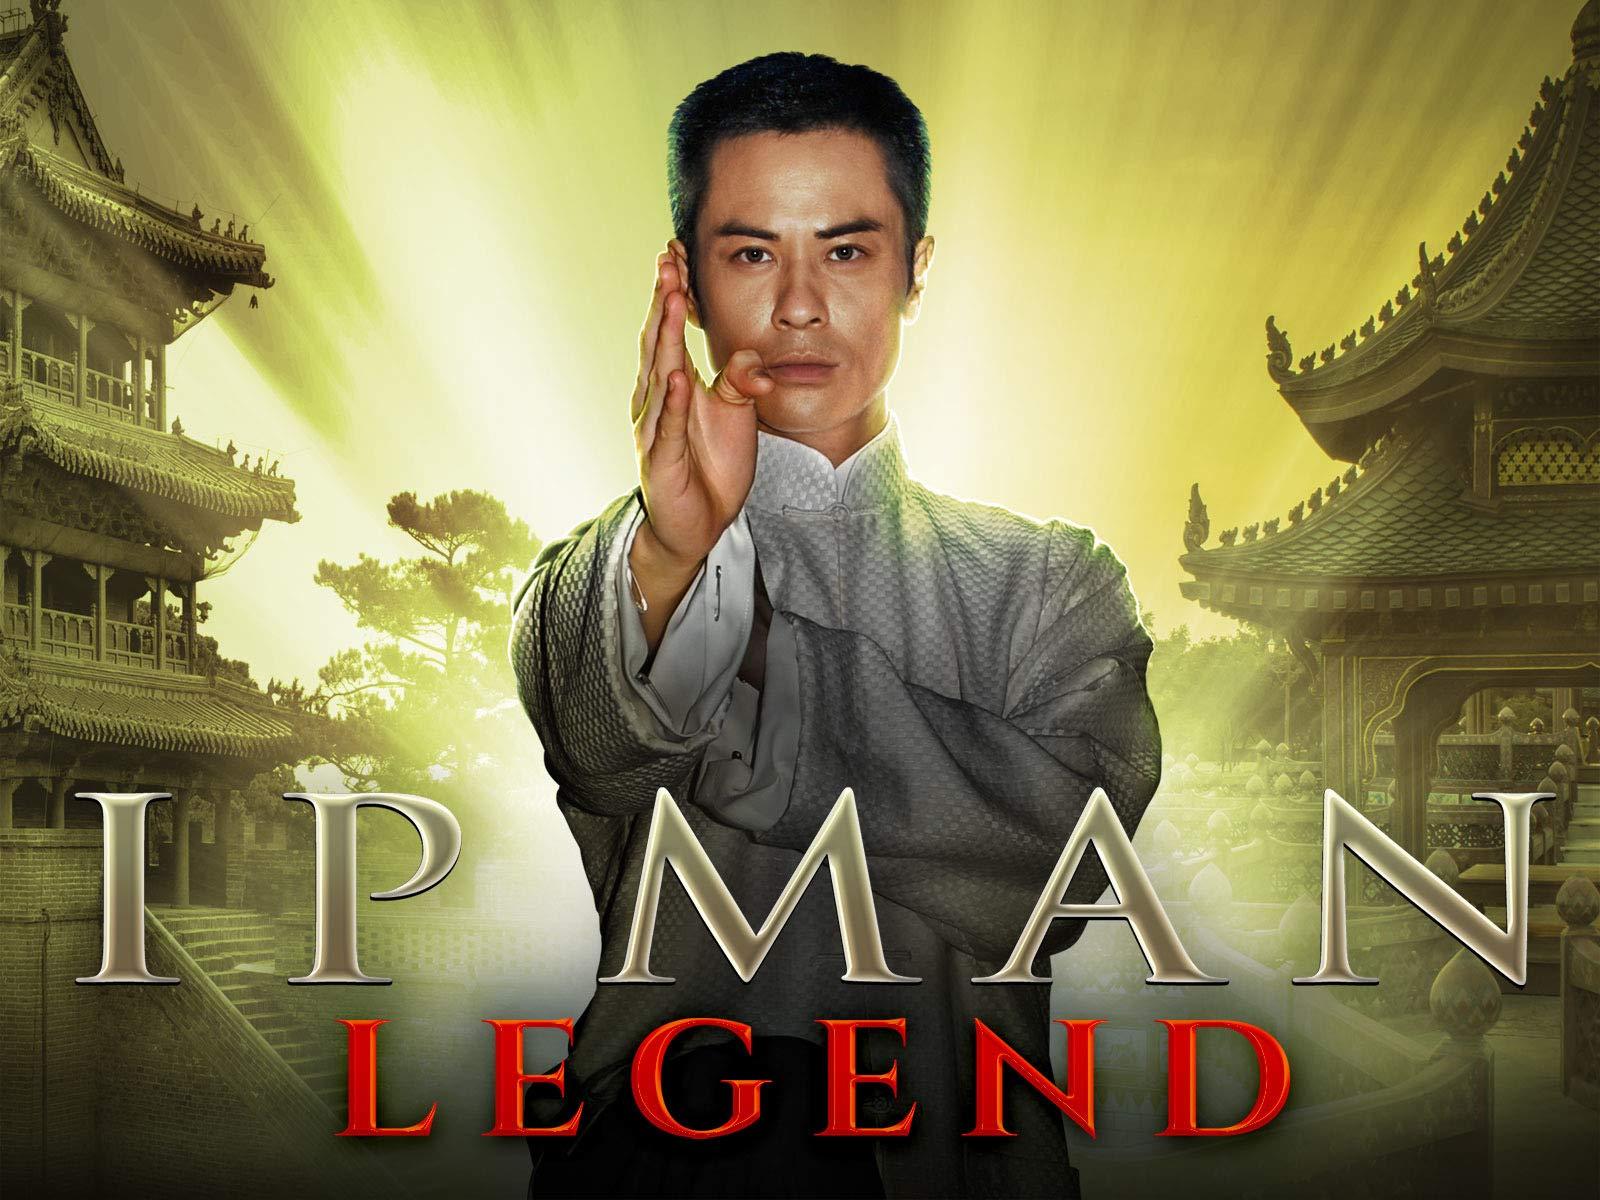 Ip Man: Legend on Amazon Prime Video UK